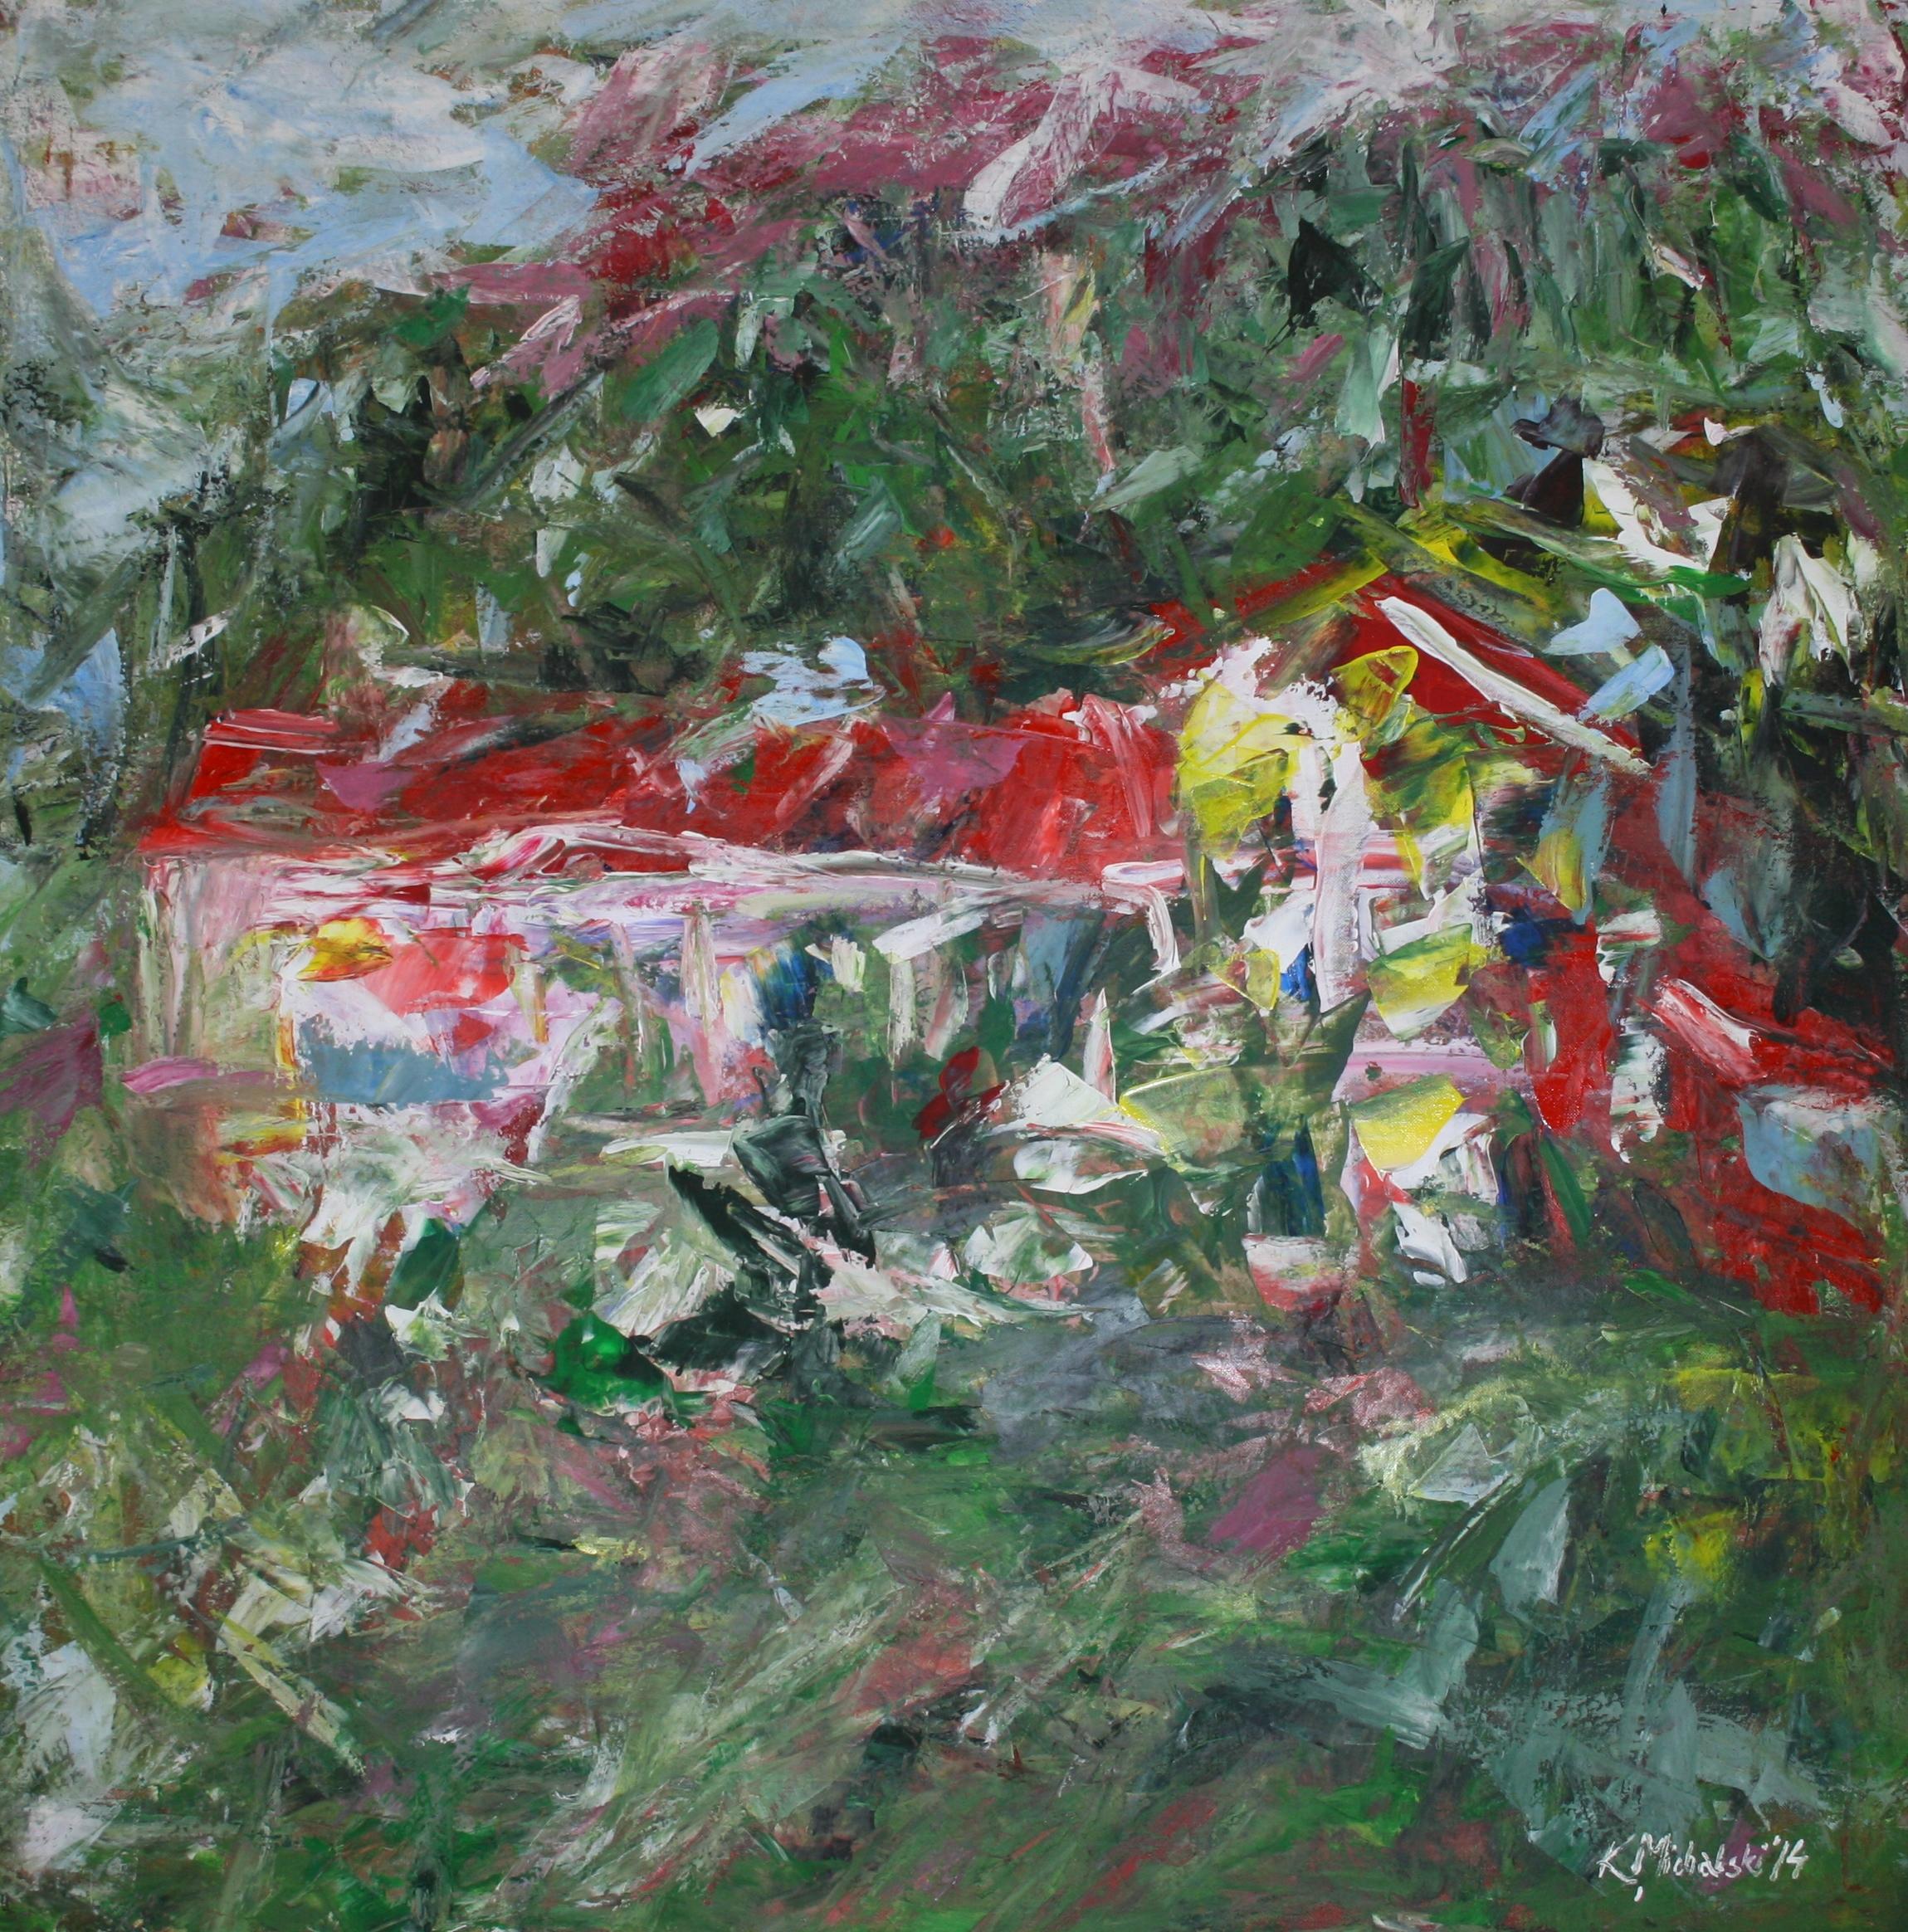 Das Haus im Grün, 2014, 100 x 100, Acryl auf Leinwand